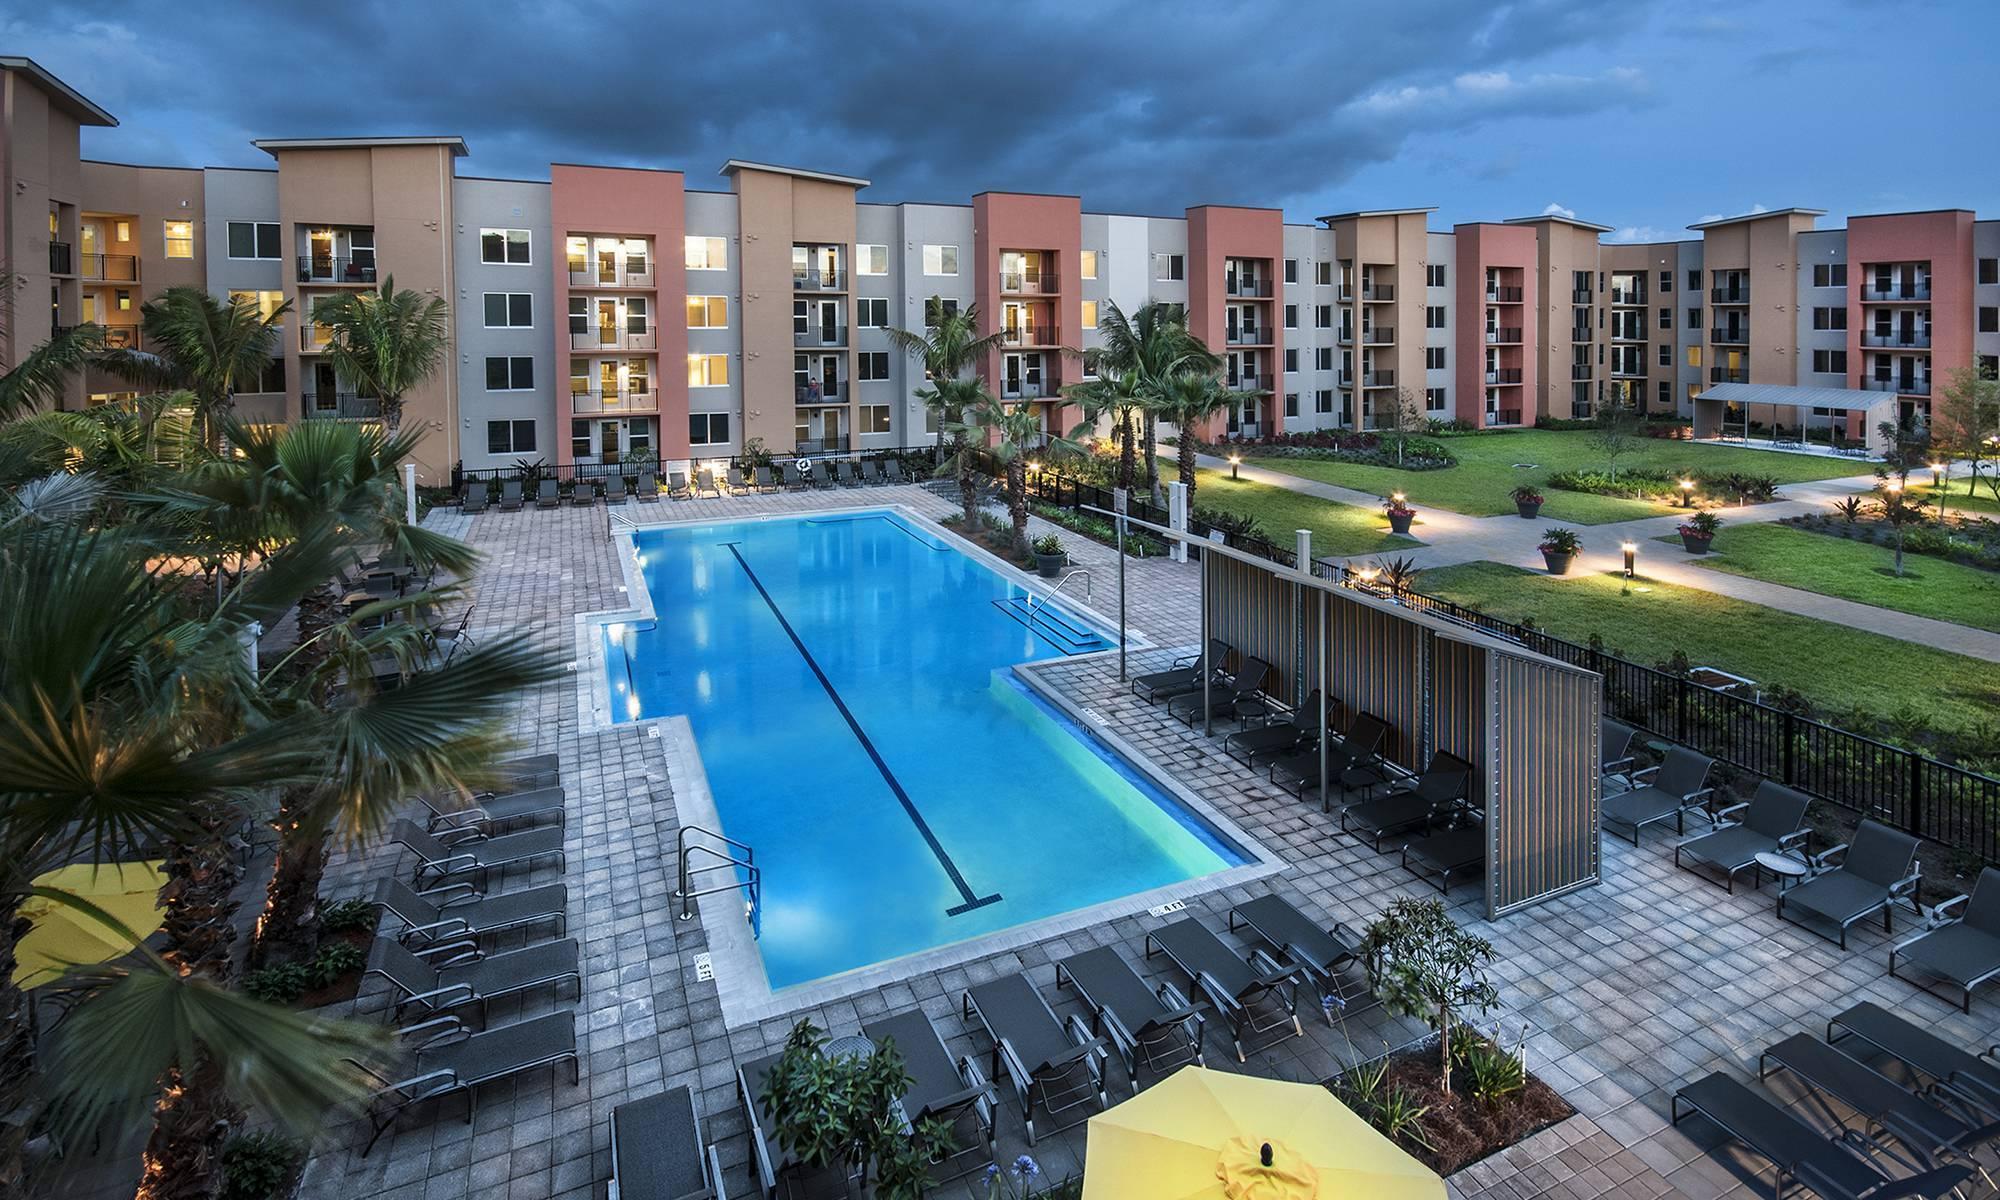 Apartments in Delray Beach, FL